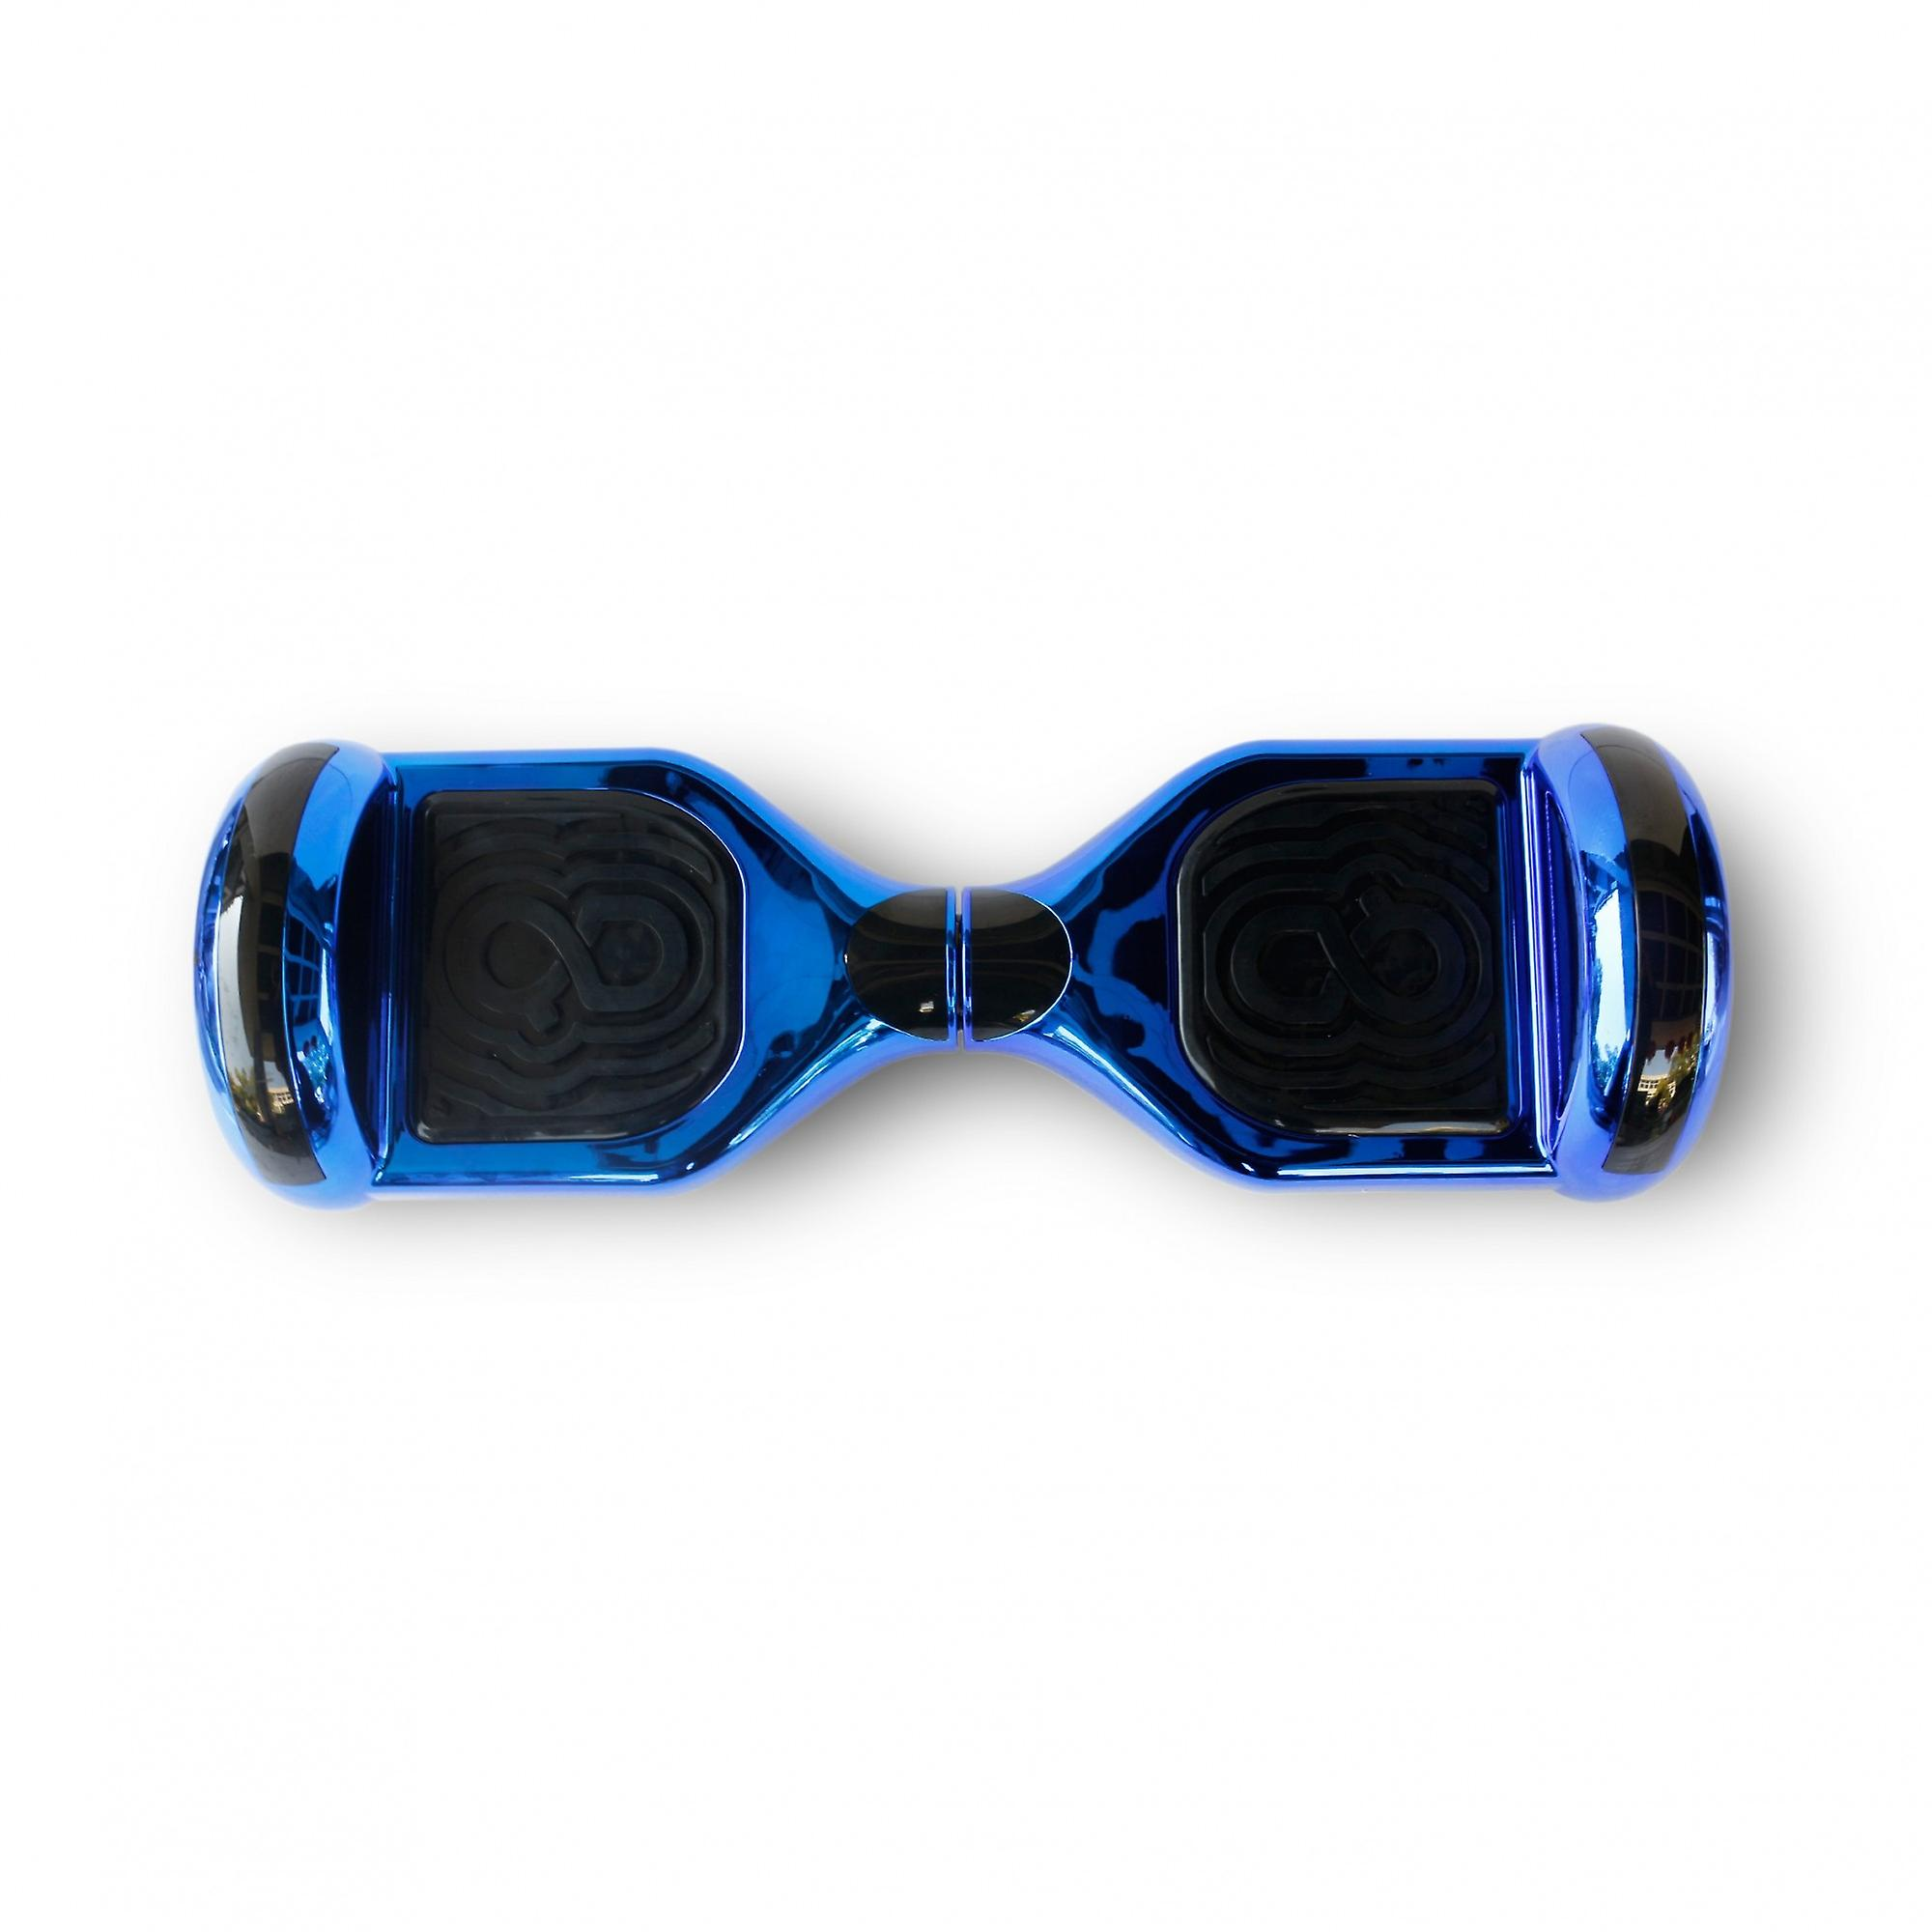 Hoverboard Skateflash K6 chroom blauw Bluetooth + transport tas